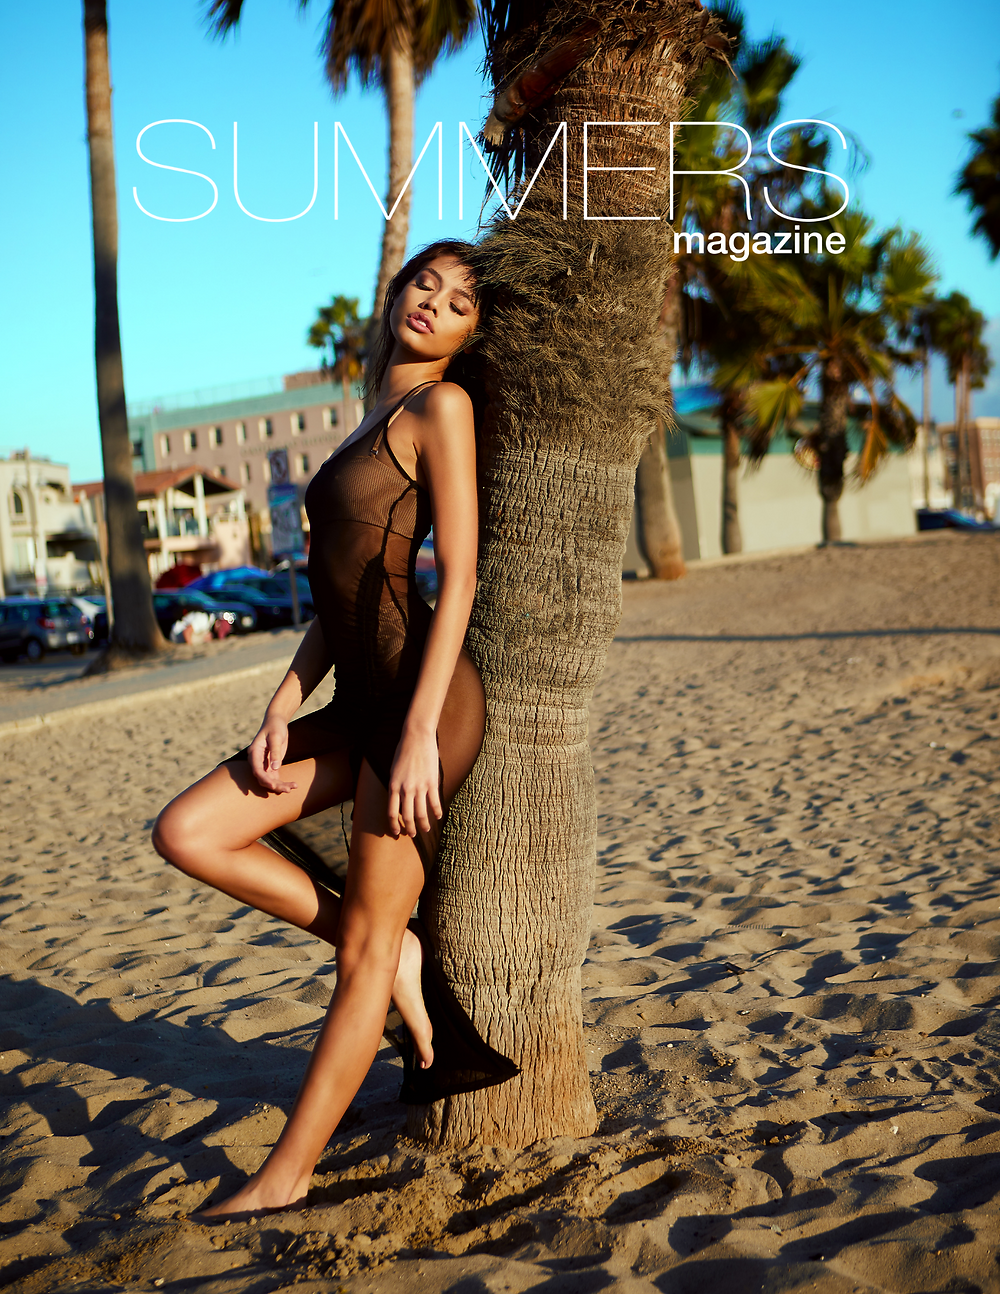 Sexy swimwear model Layla Palma on the cover of Summers Magazine by Patrick Patton